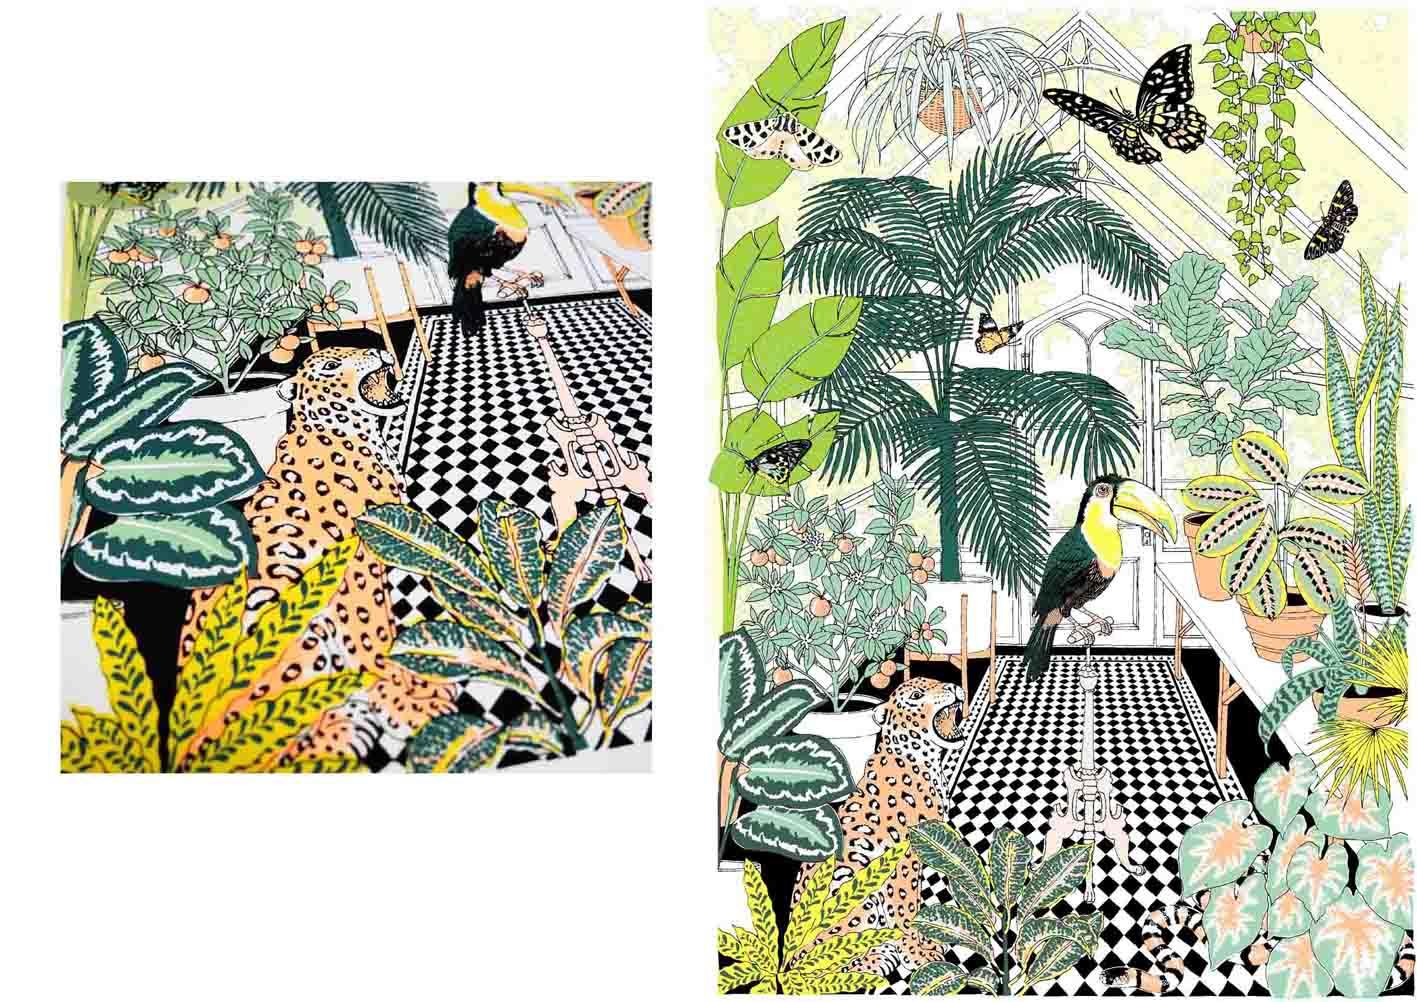 Explorers-Greenhouse-Jungle-Screenprint-1-sm.jpg